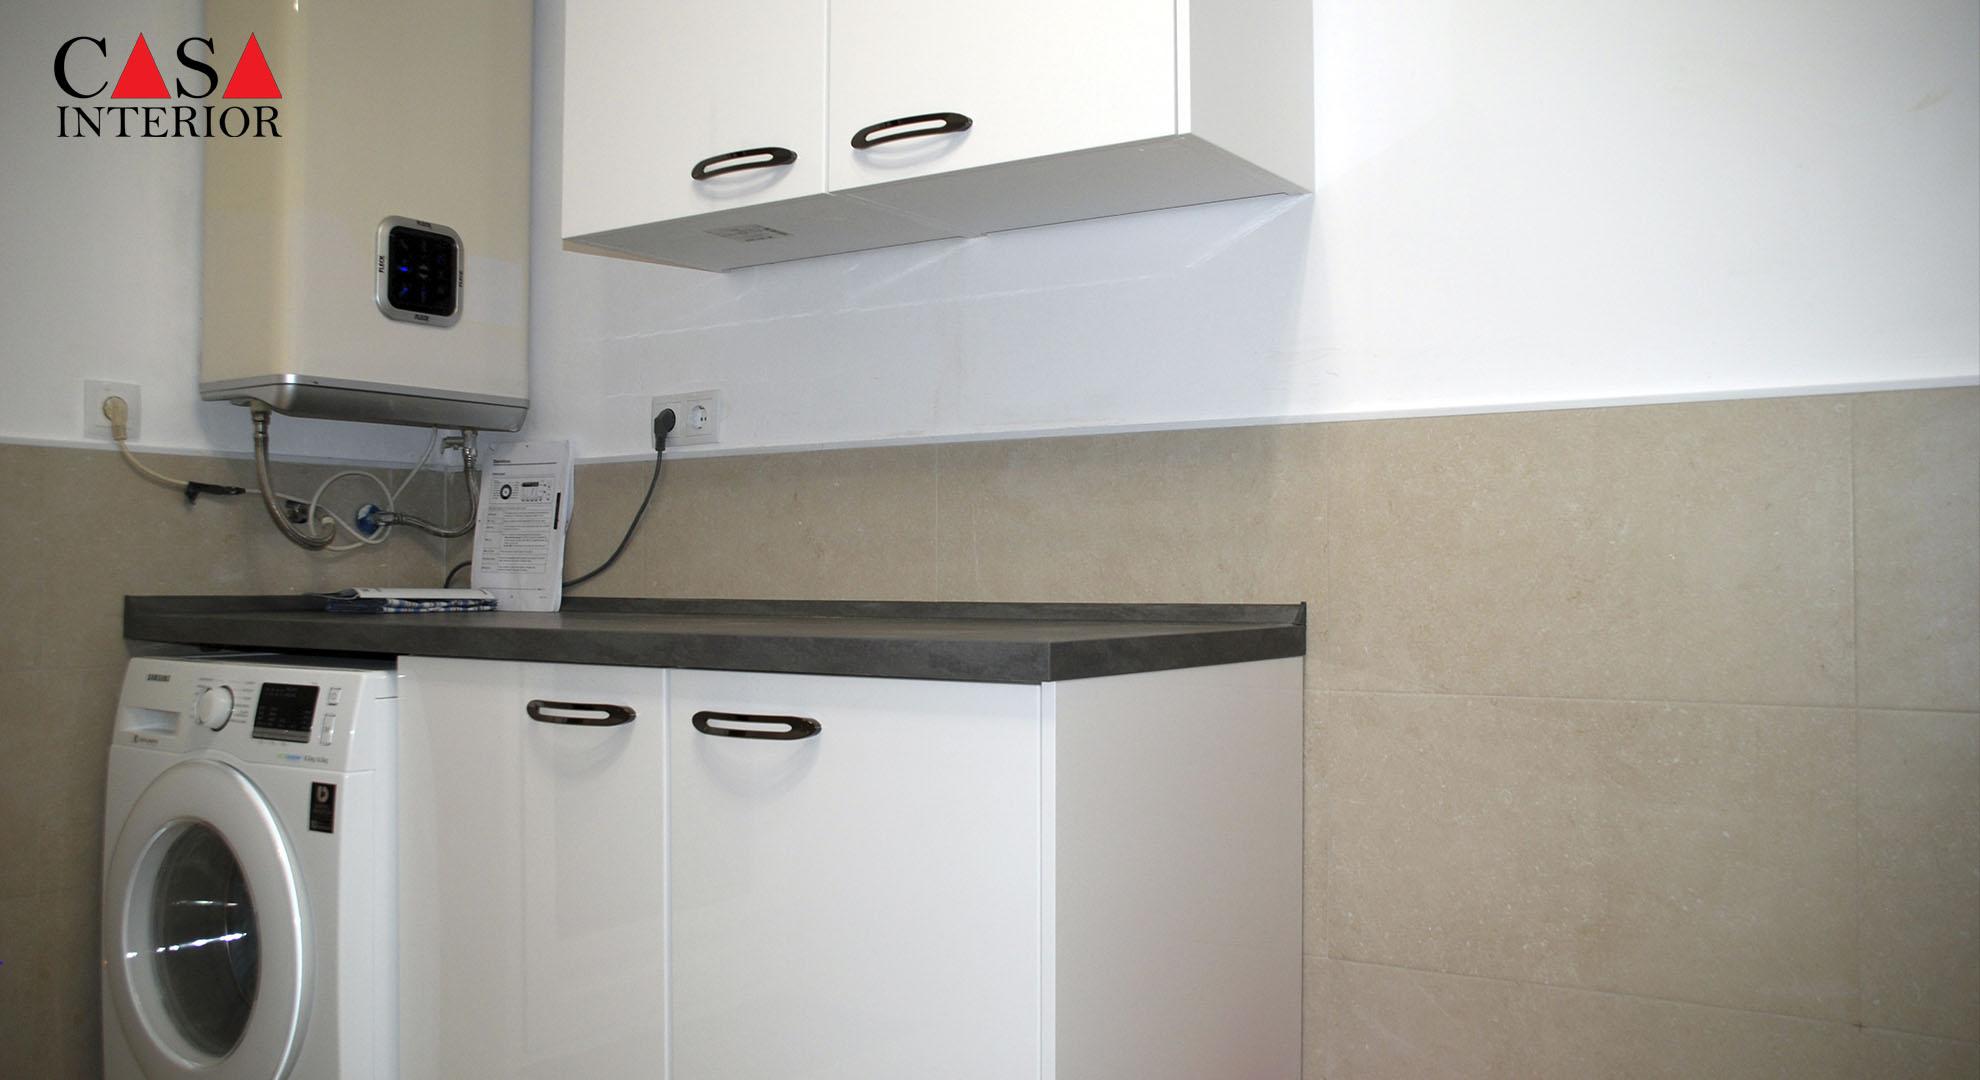 Küchentime Flash Alpine White High Gloss Alfaz del Pi - Laundry Room (1)